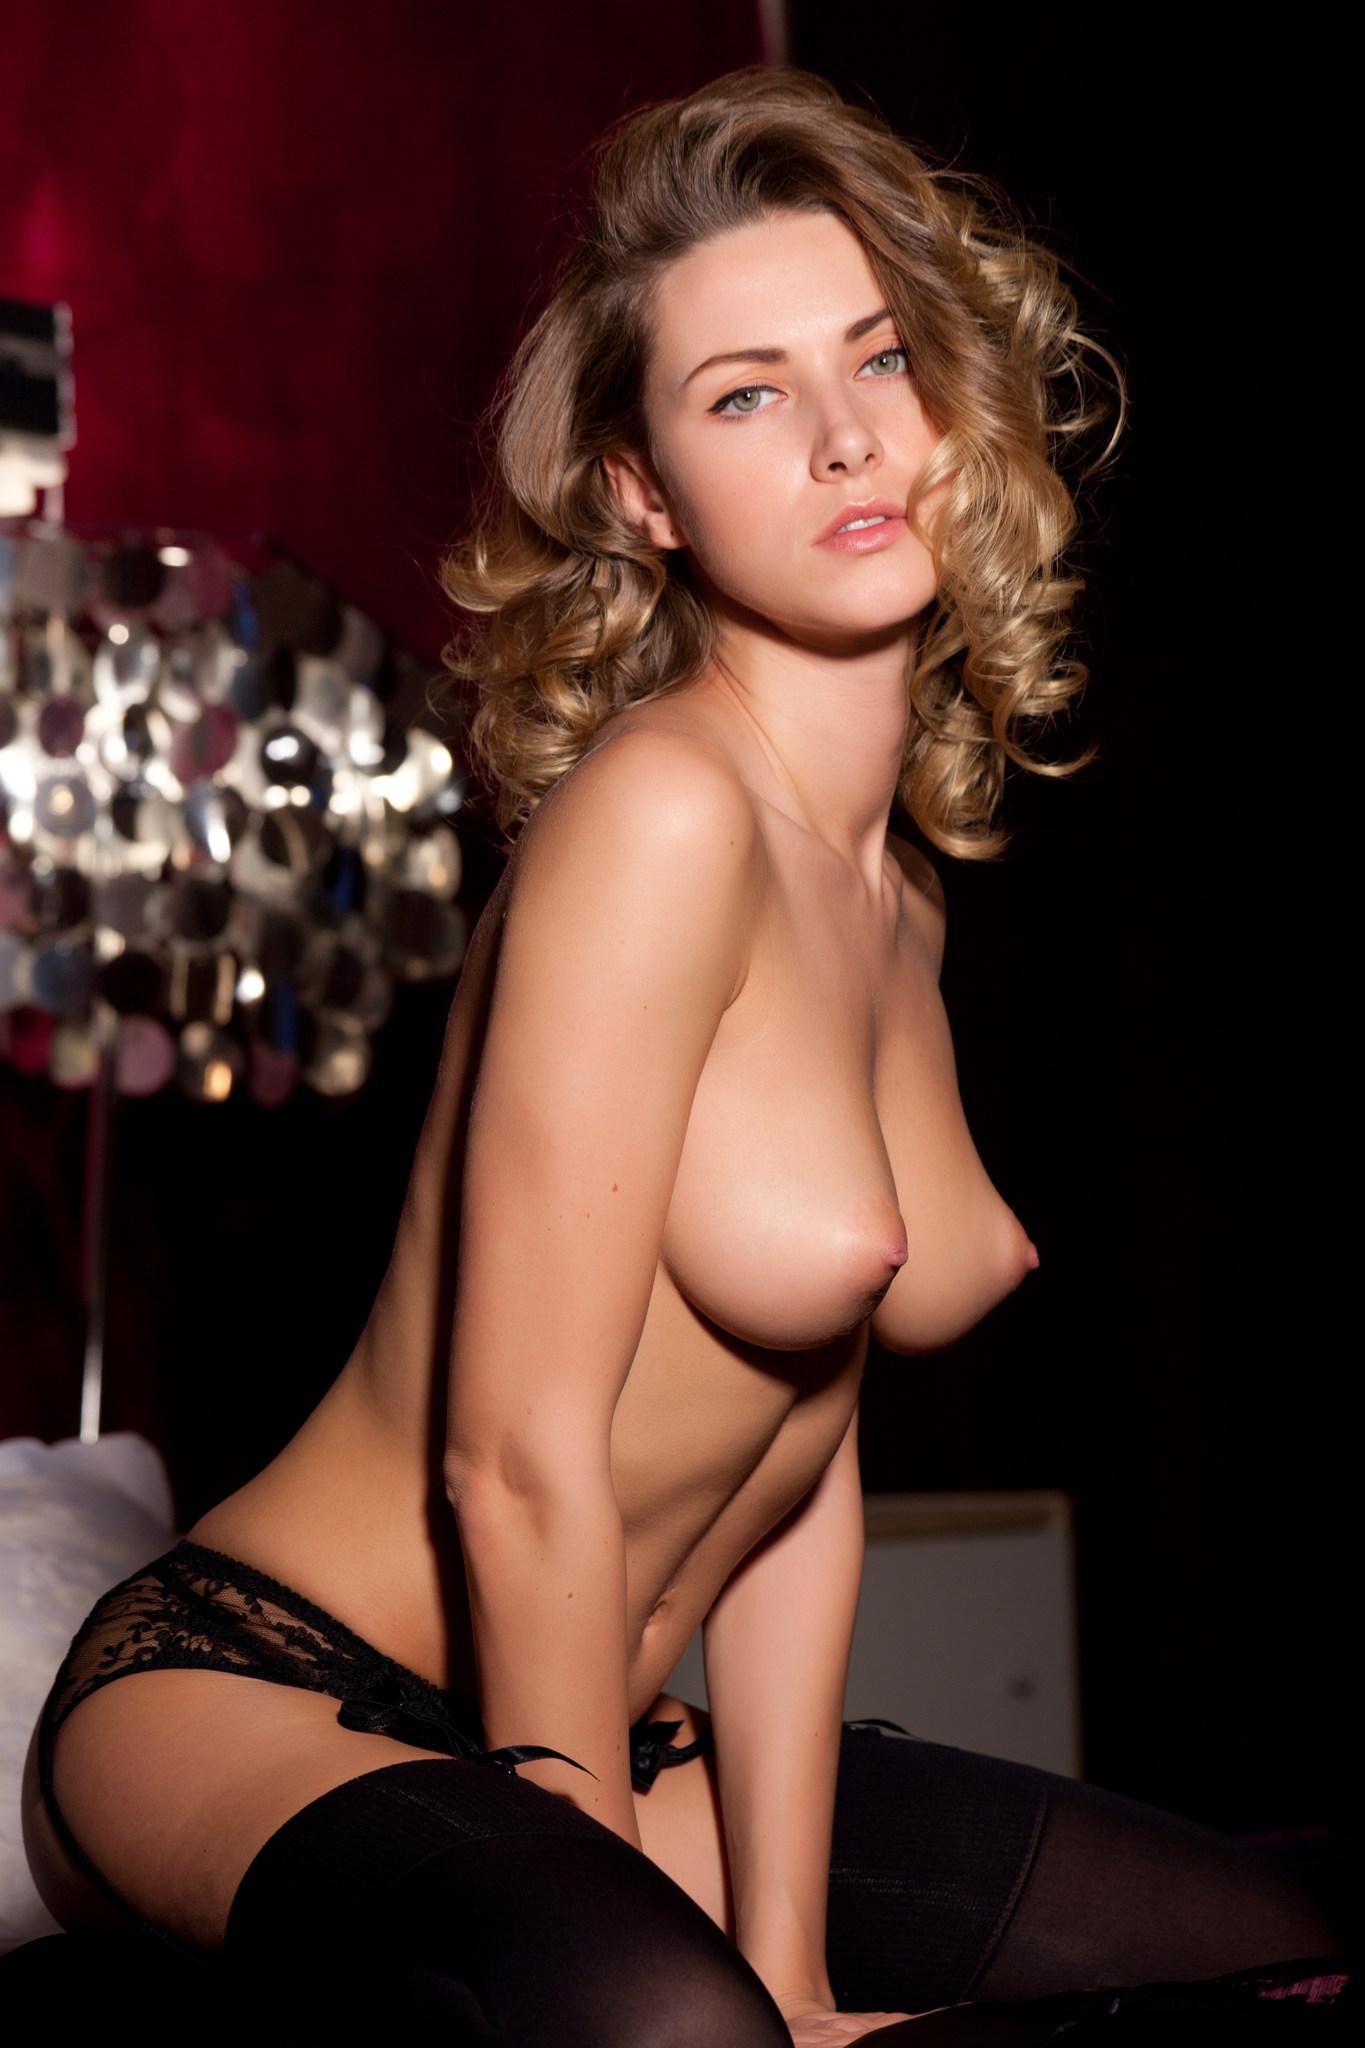 Porno Olga Alberti nude photos 2019